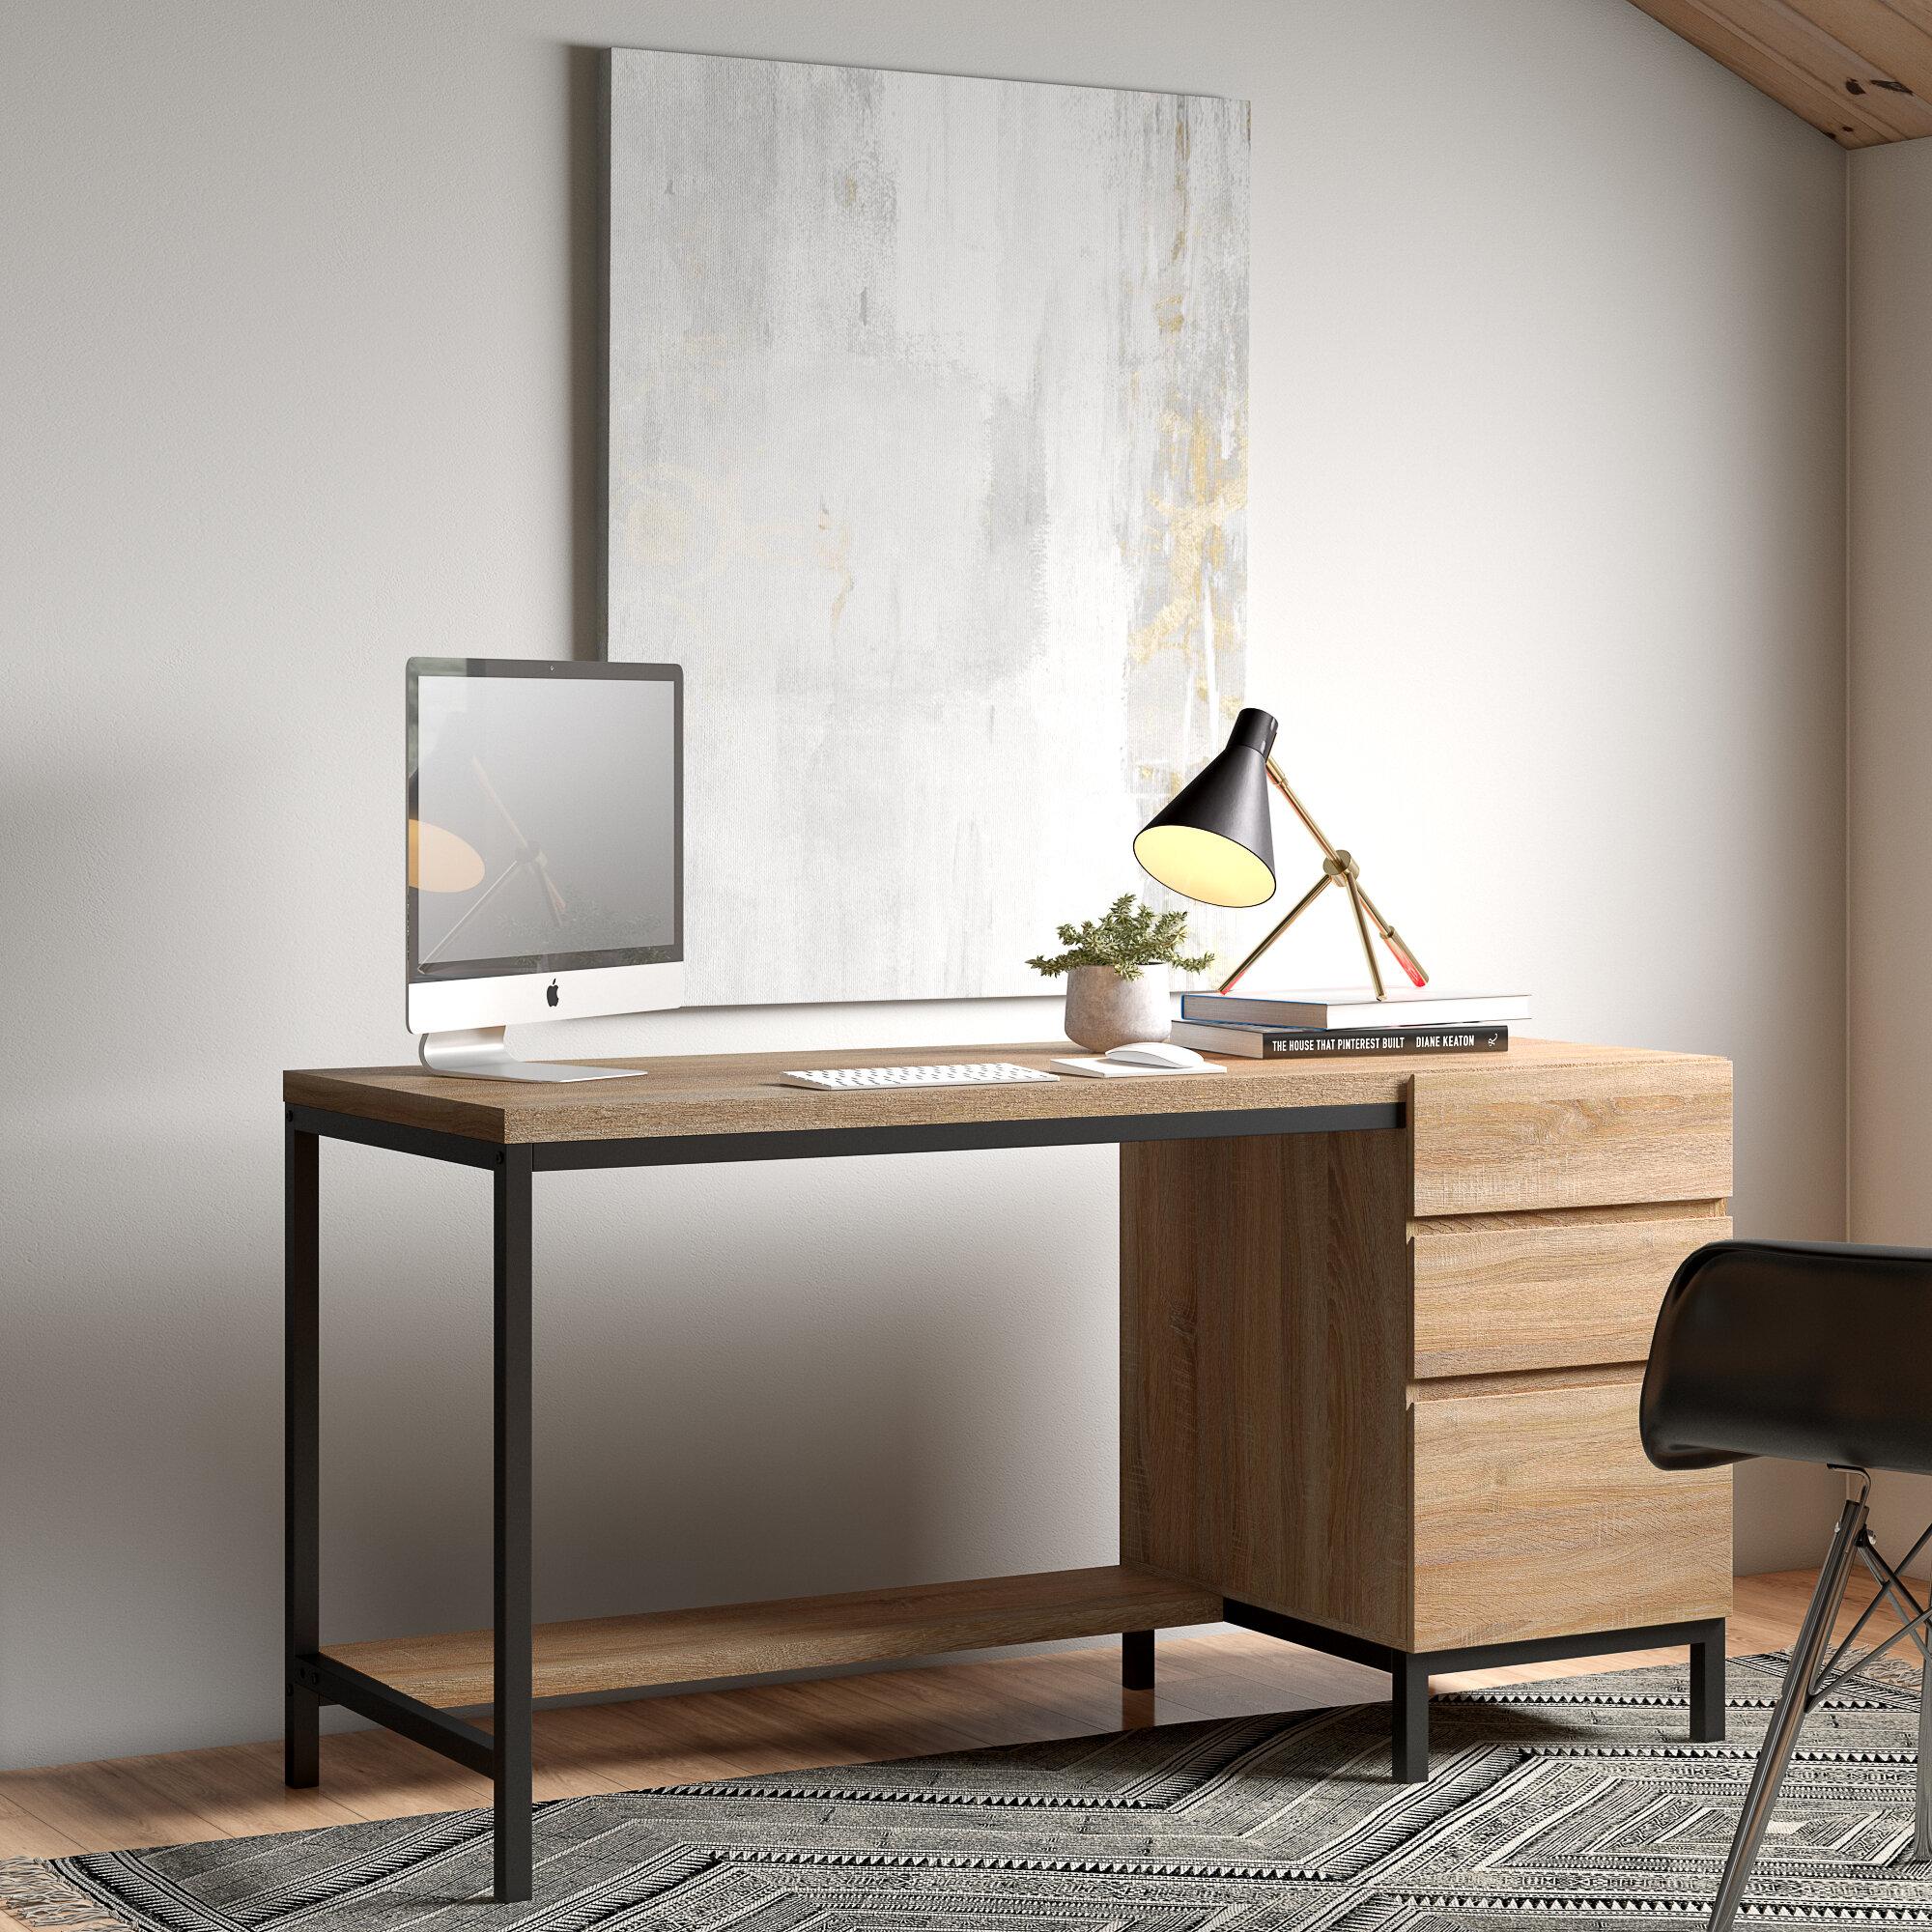 Modern Deep Greater Than 30 In Desks Allmodern